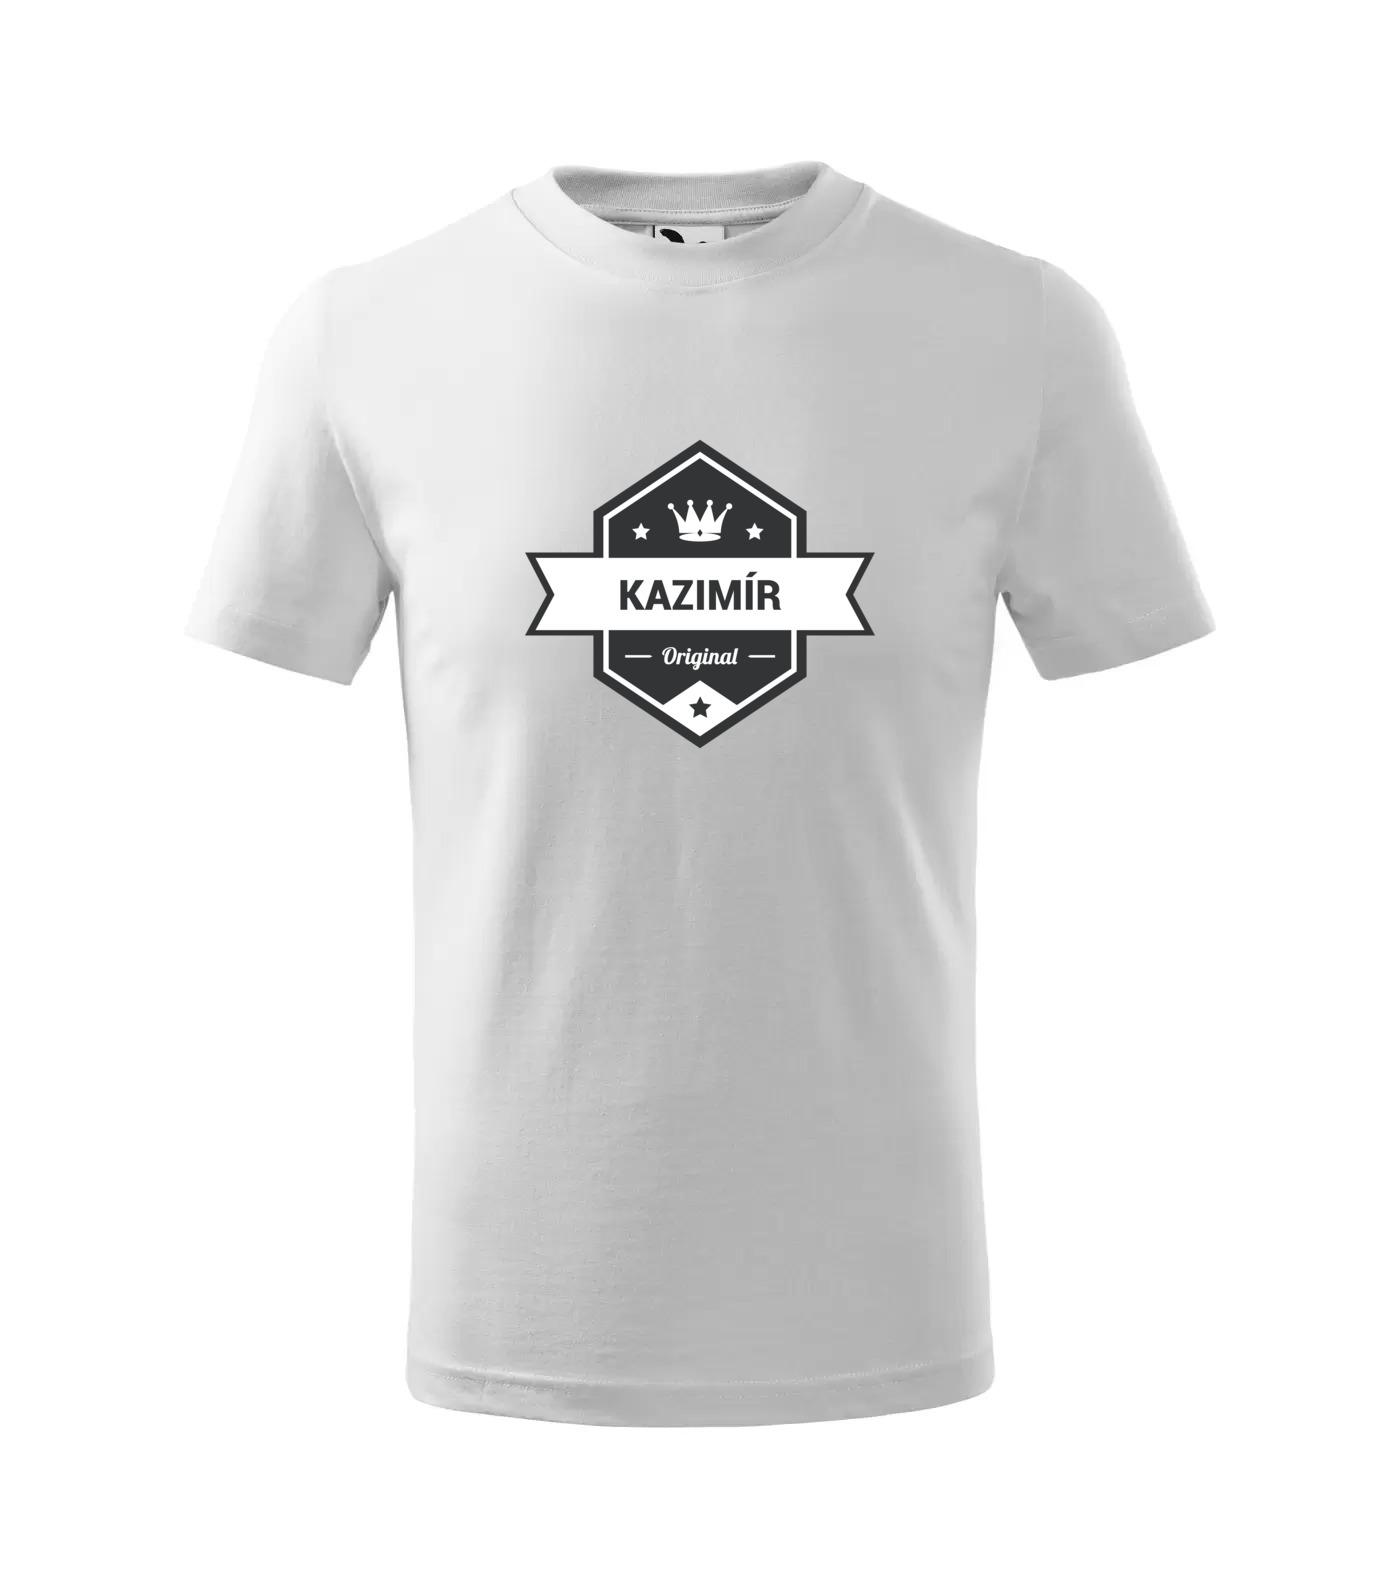 Tričko King Kazimír